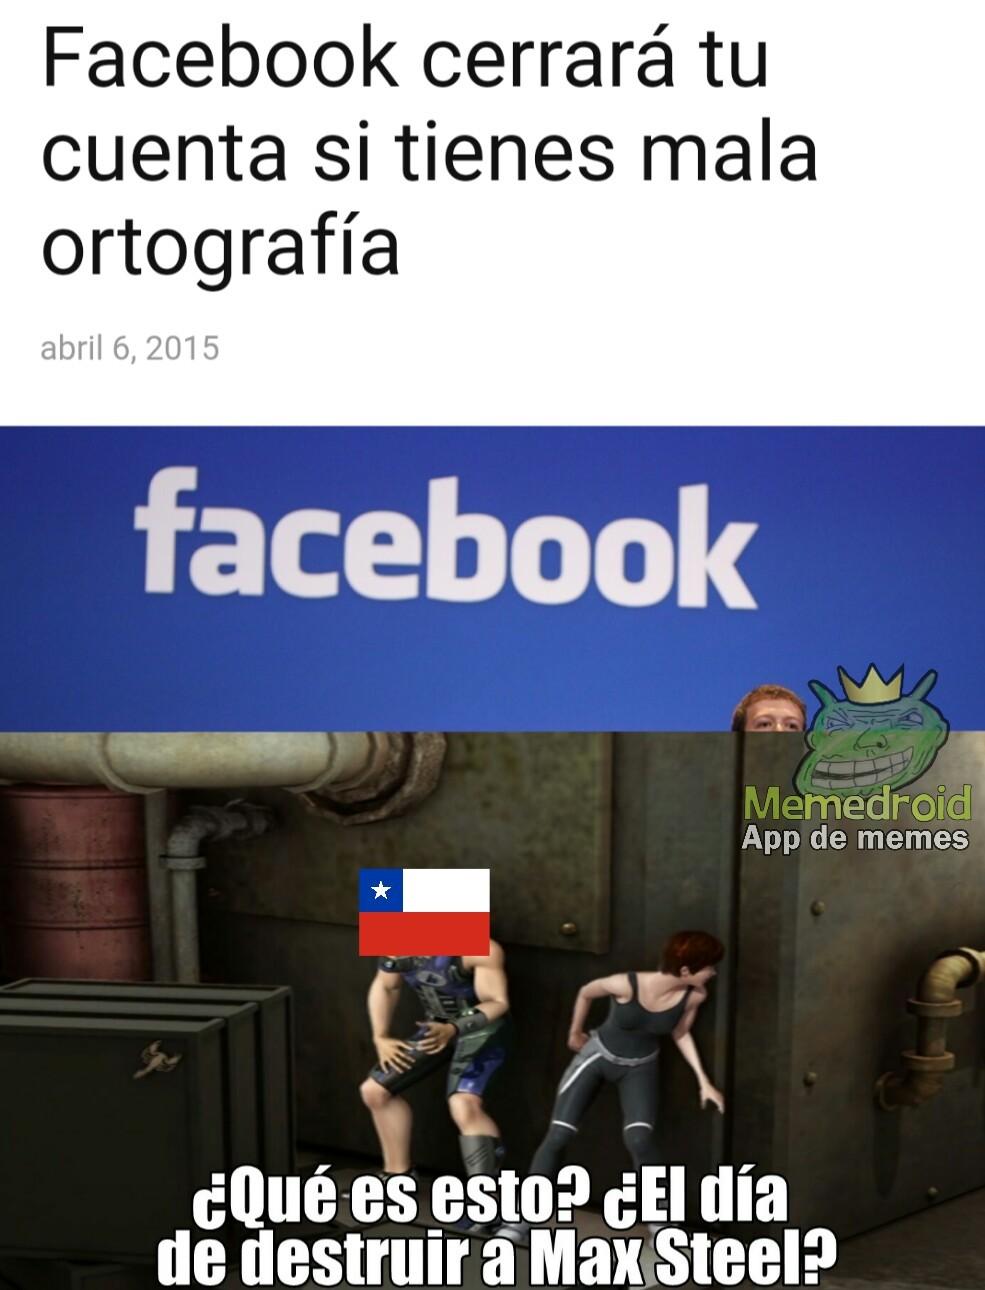 aii kliche desir k los chilenos ablan mal reportado por no ser orijinal - meme